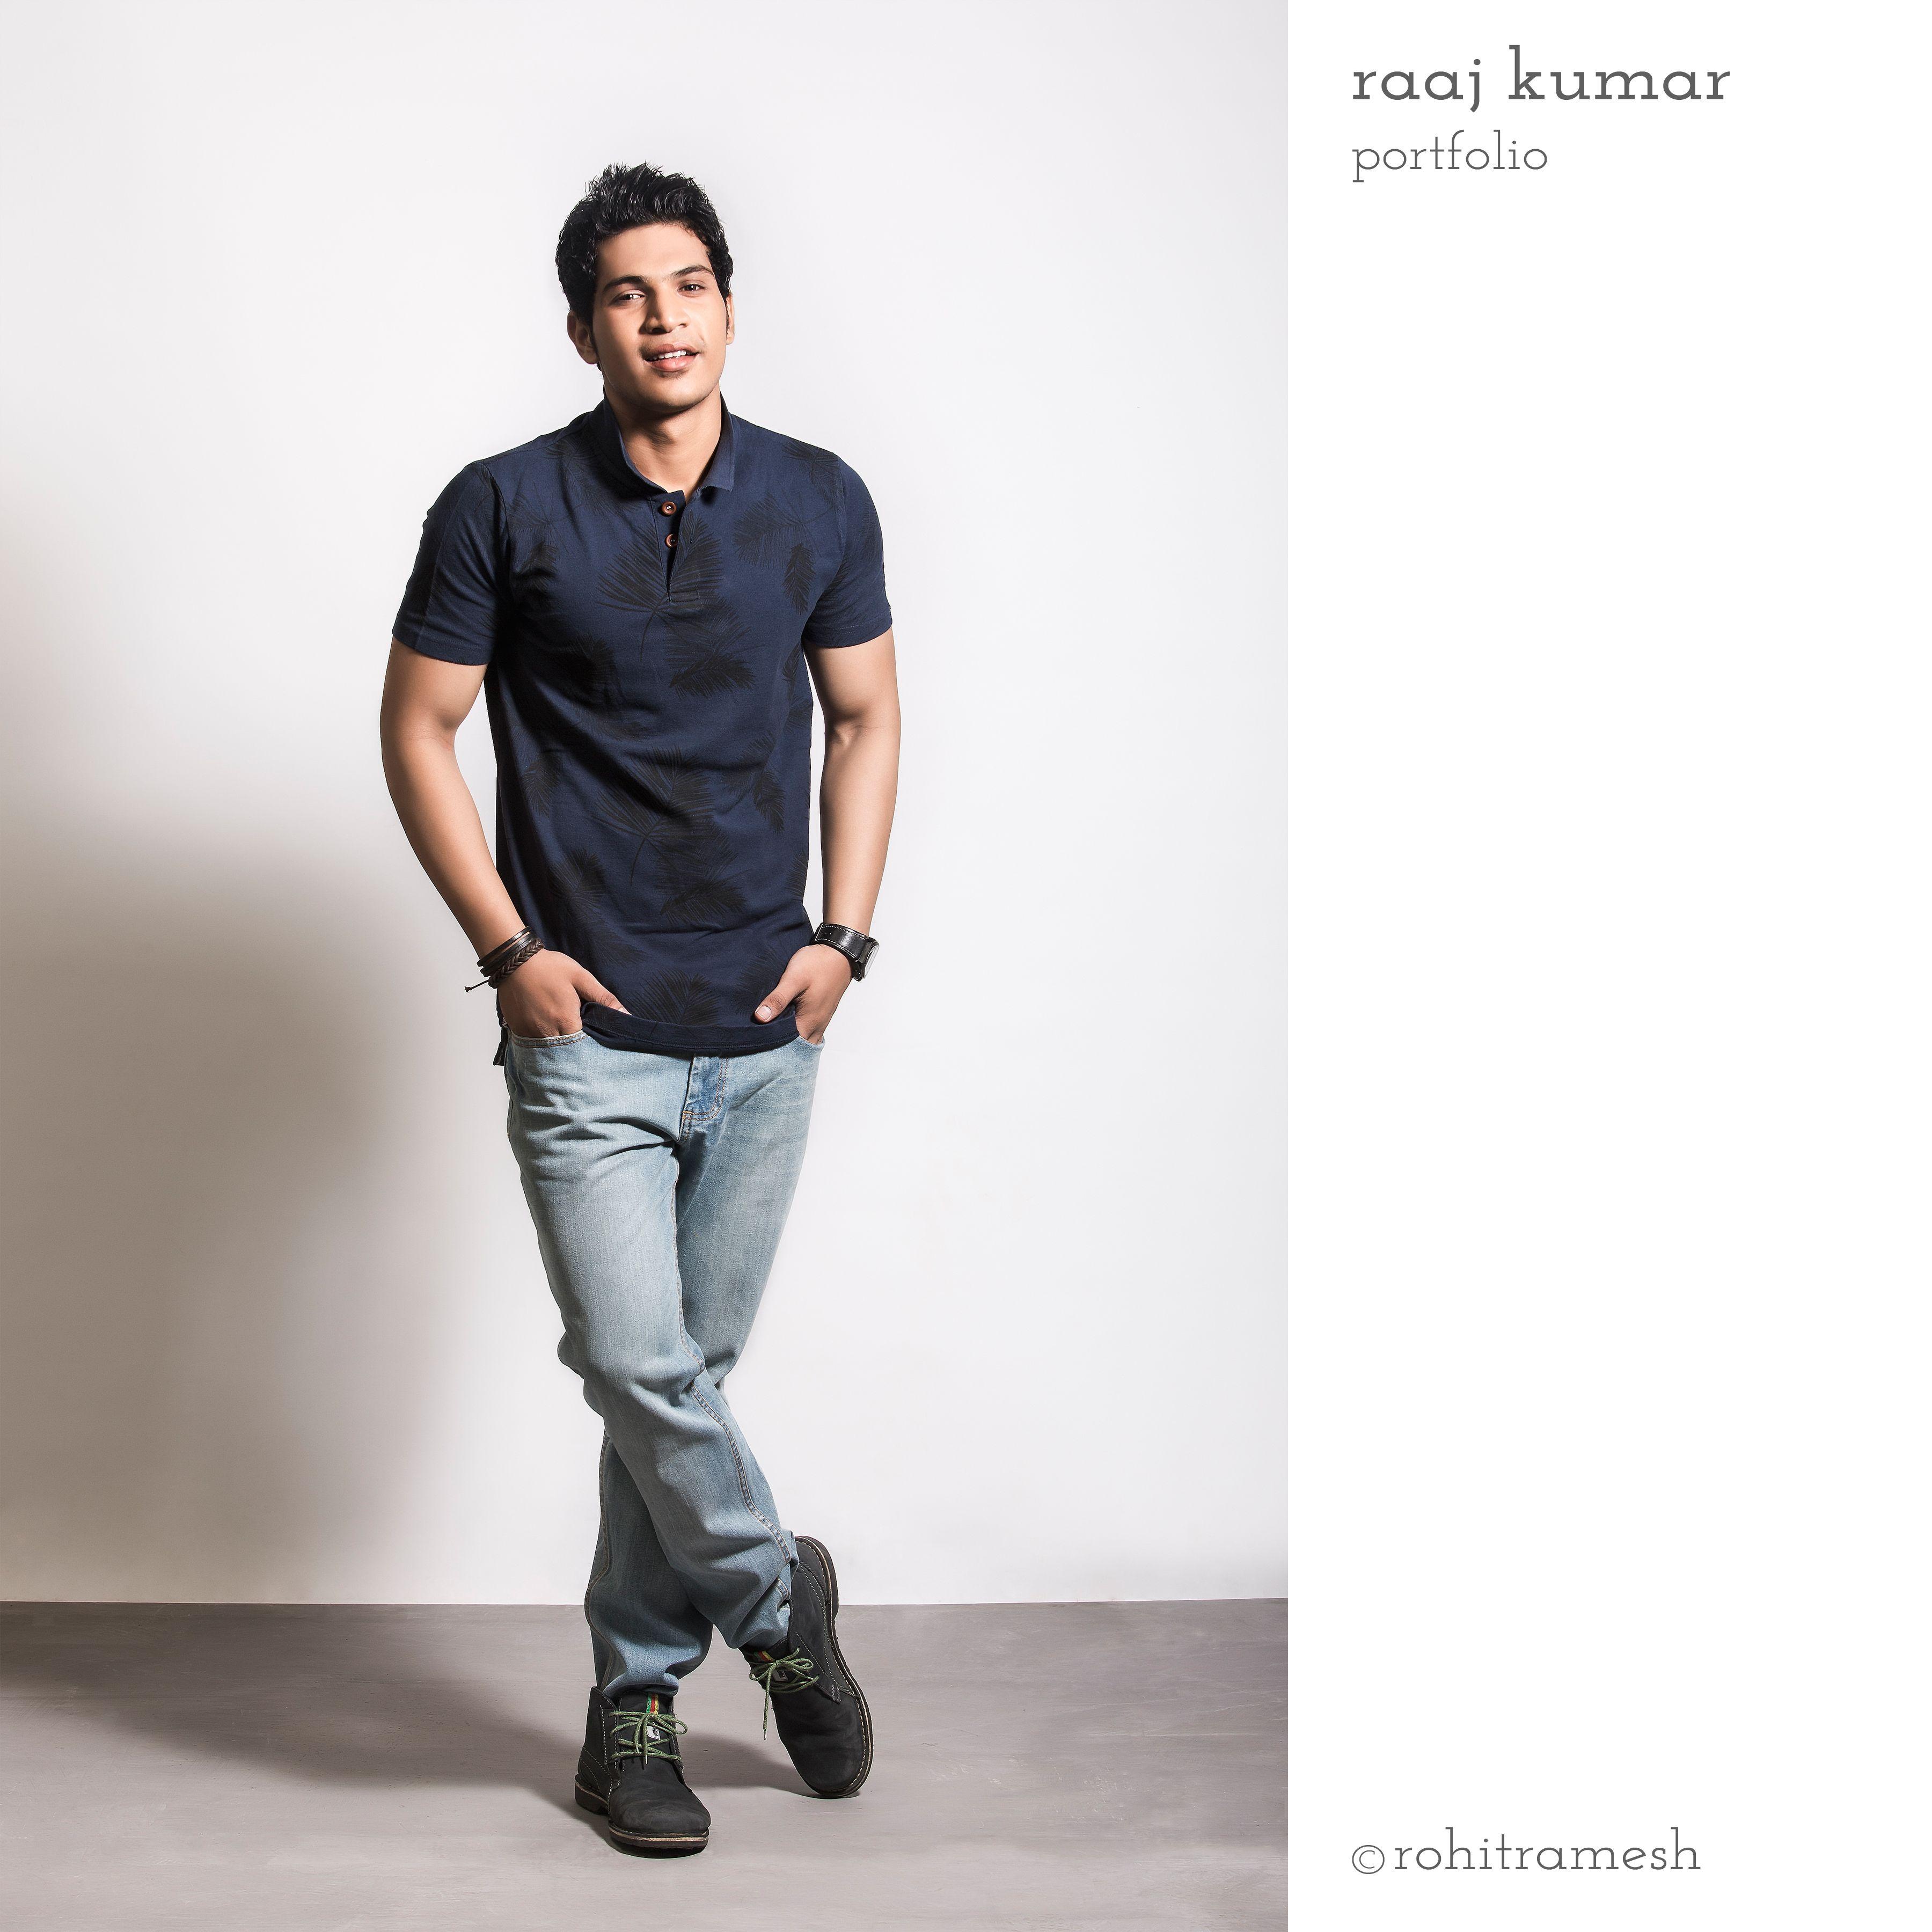 Casual Wear Men Fashion Modeling Photography Raaj Kumar Portfolio By Rohit Ramesh